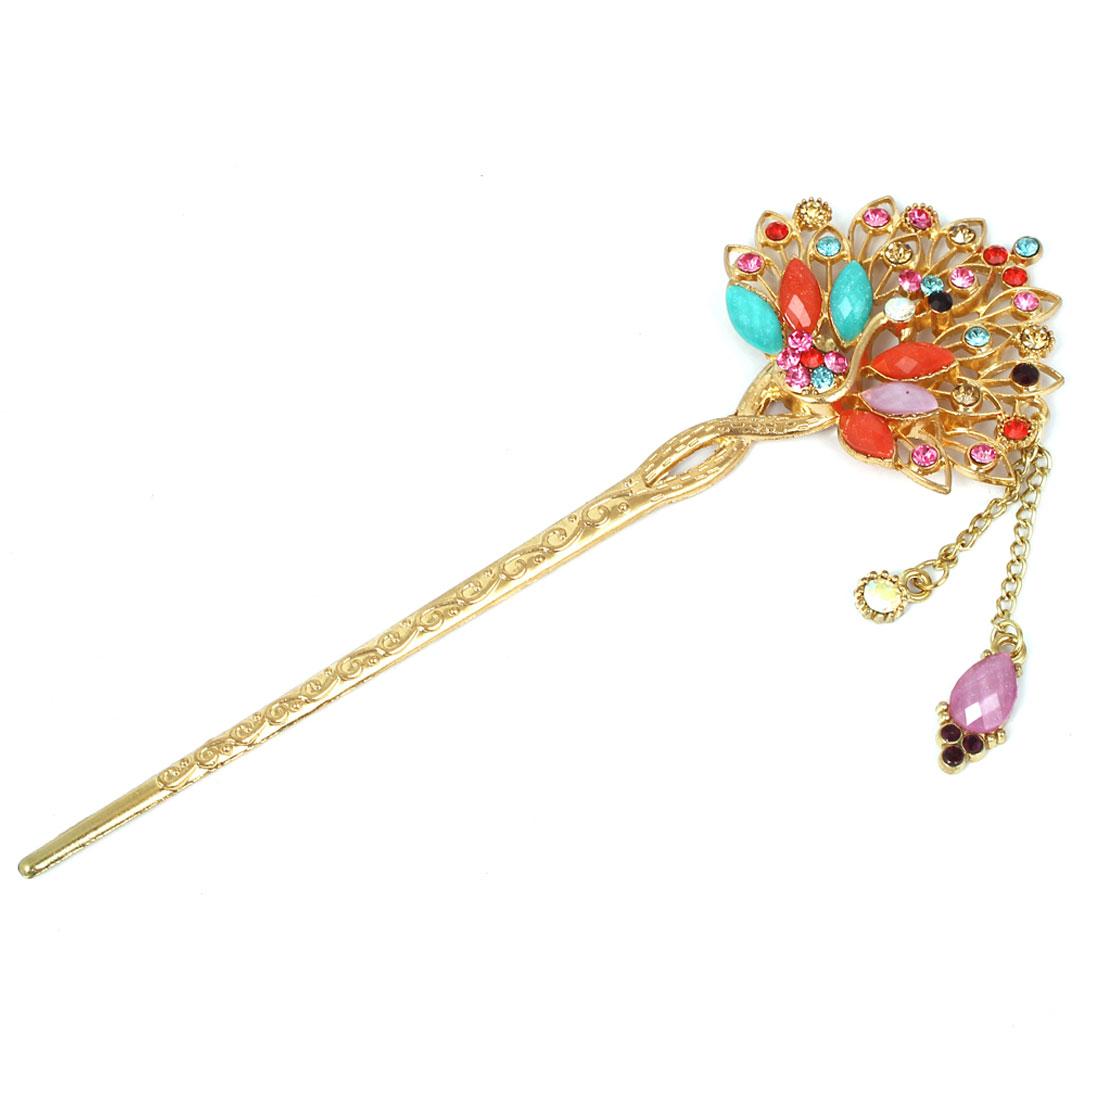 Women Faux Rhinestone Decor Peacock Shaped Dangling Hairpin Hair Stick Colorful